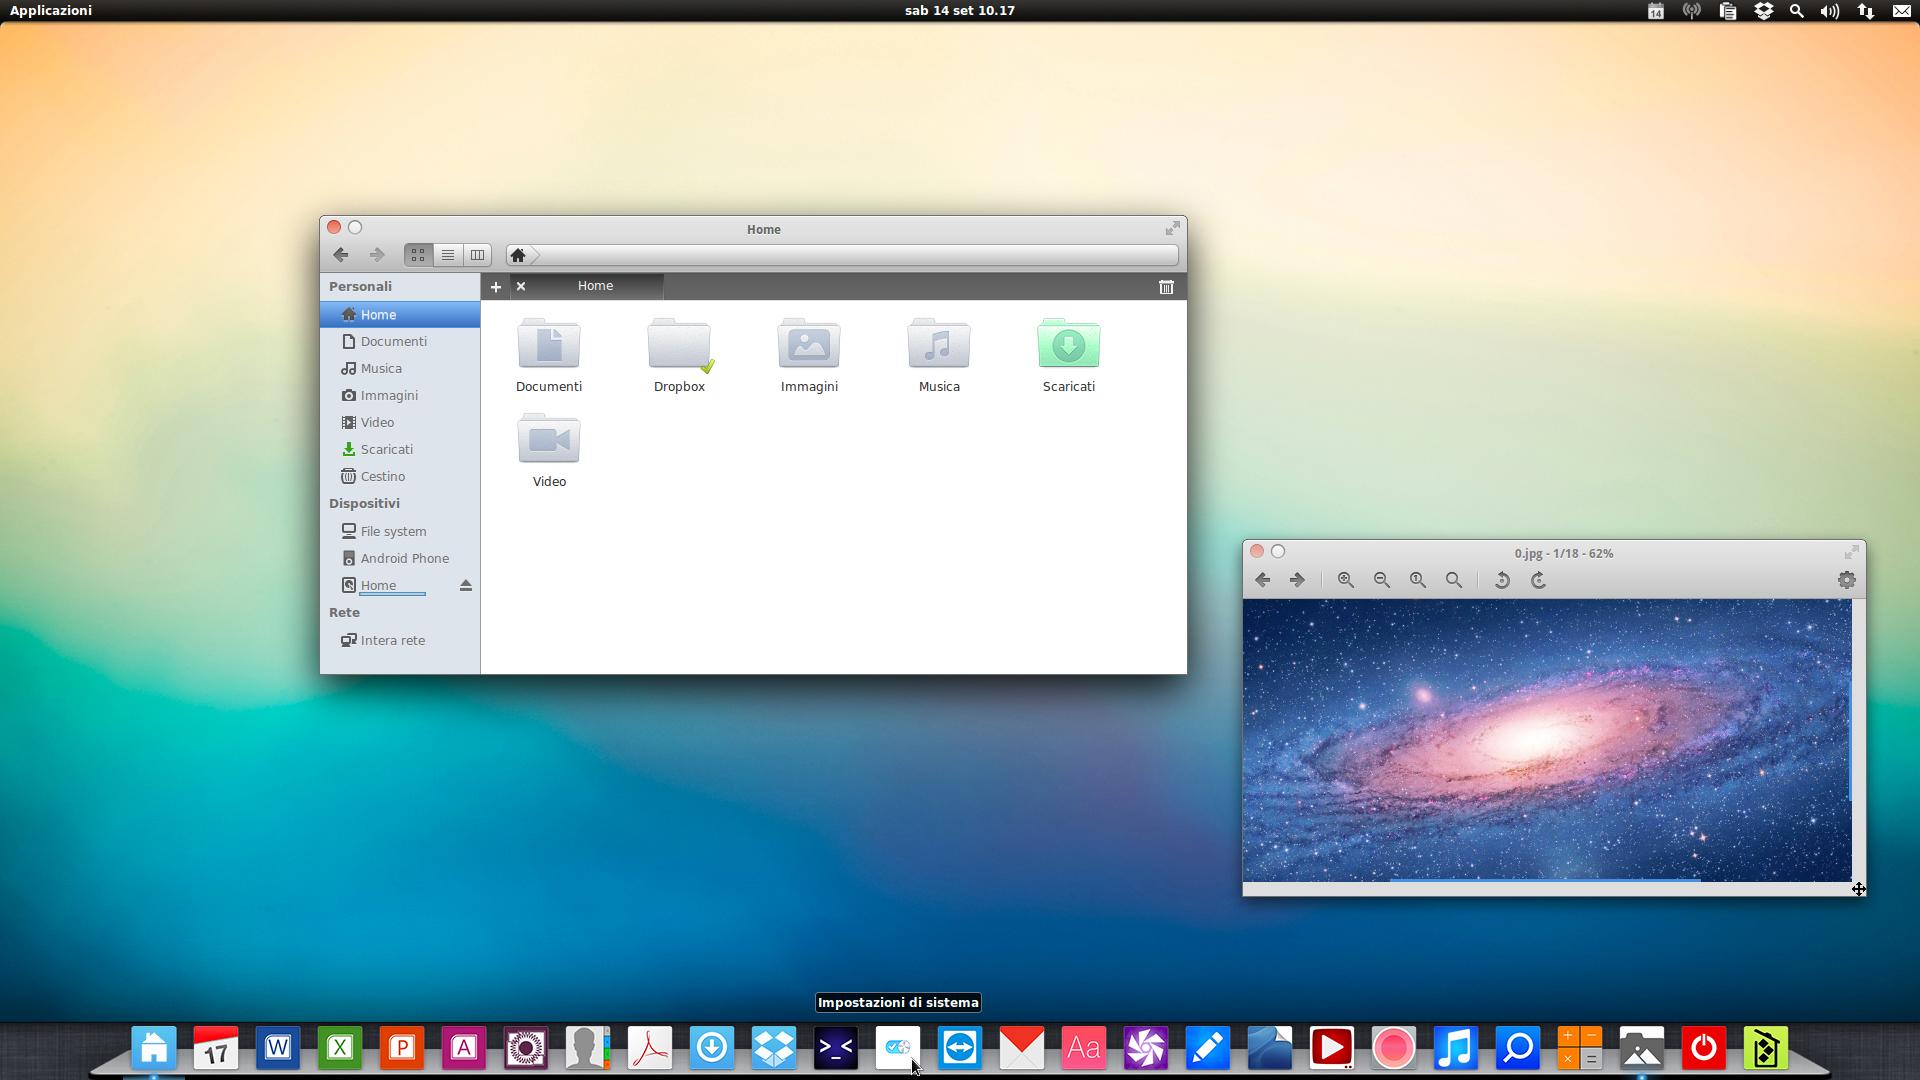 [2013-09-14101749] -iMac by ldm85